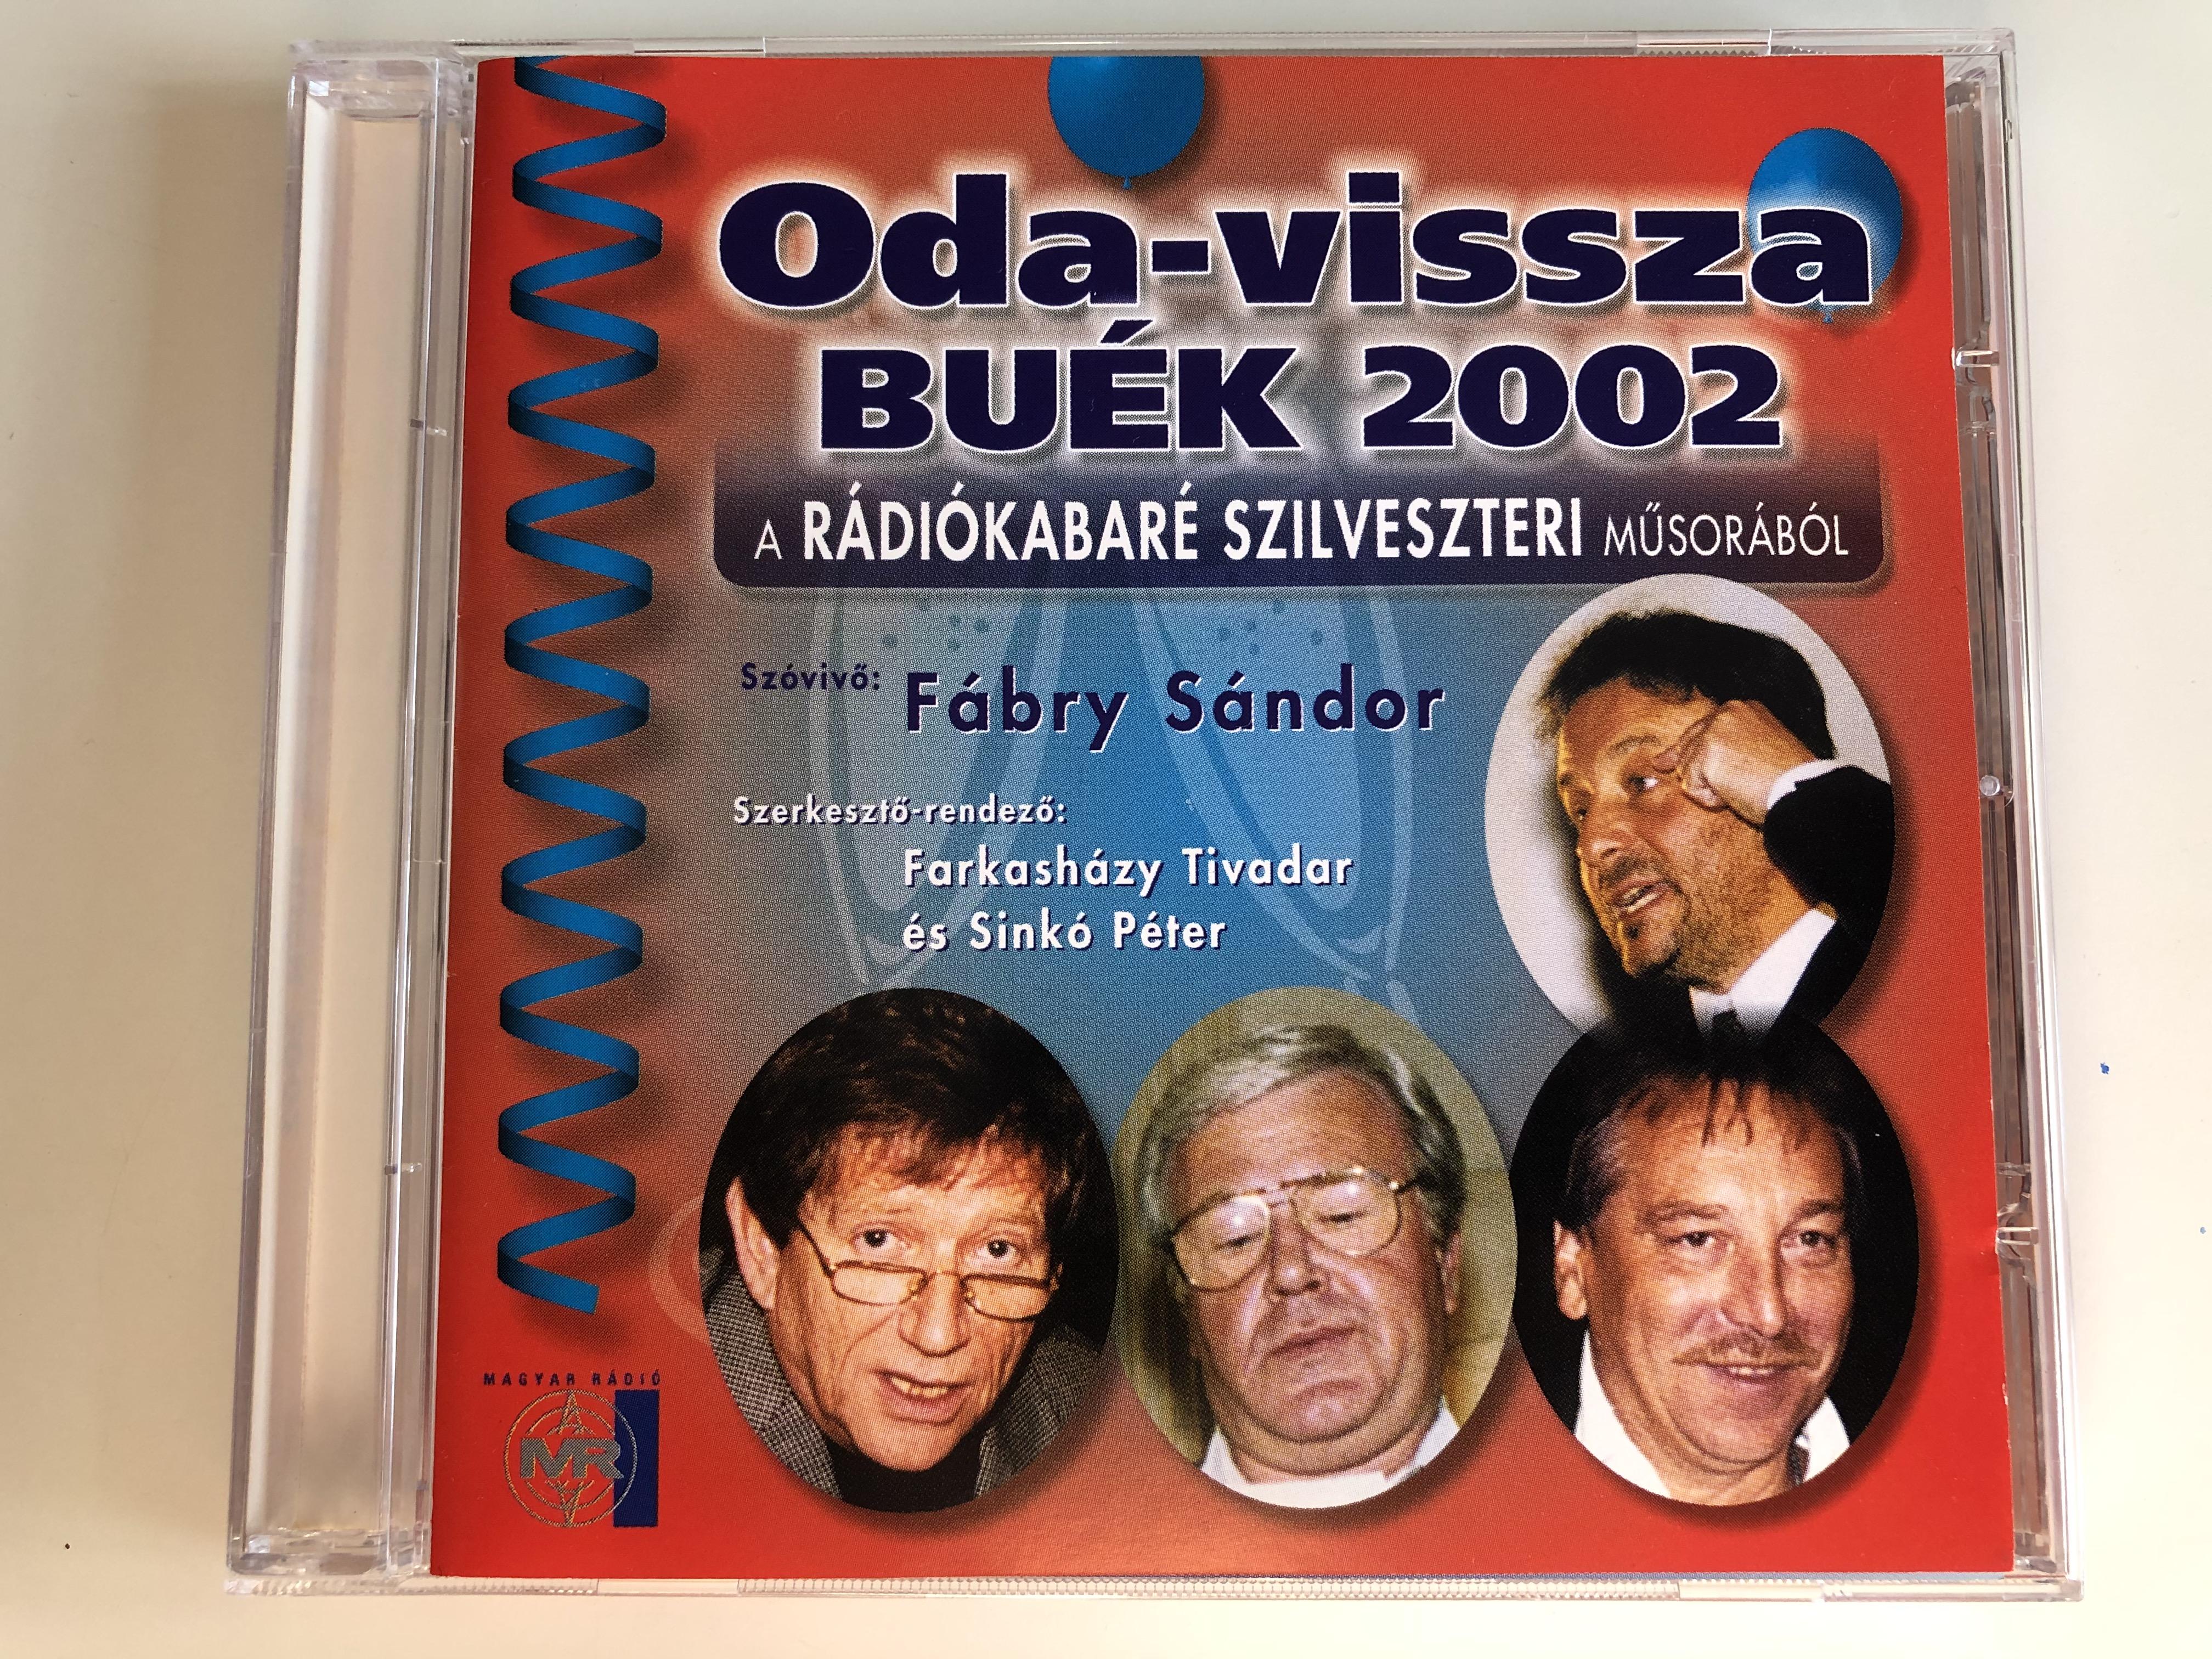 oda-vissza-buek-2002-a-radiokabare-szilveszteri-musorabol-szovivo-fabry-sandor-szerkeszto-rendezo-farkashazy-tivadar-es-sinko-peter-magyar-radio-audio-cd-2002-74321-928252-1-.jpg